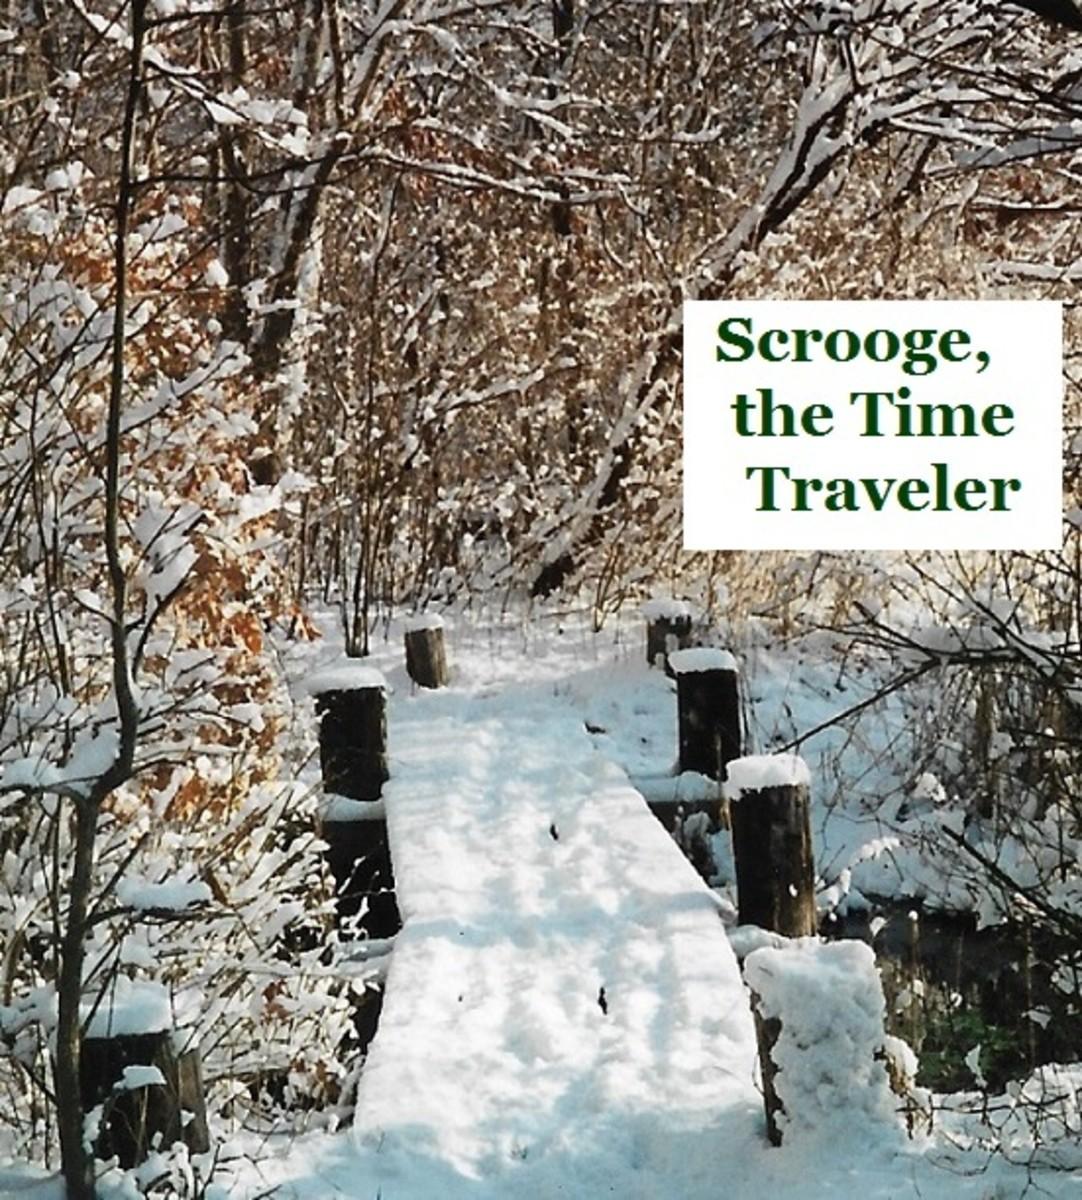 scrooge-time-traveler